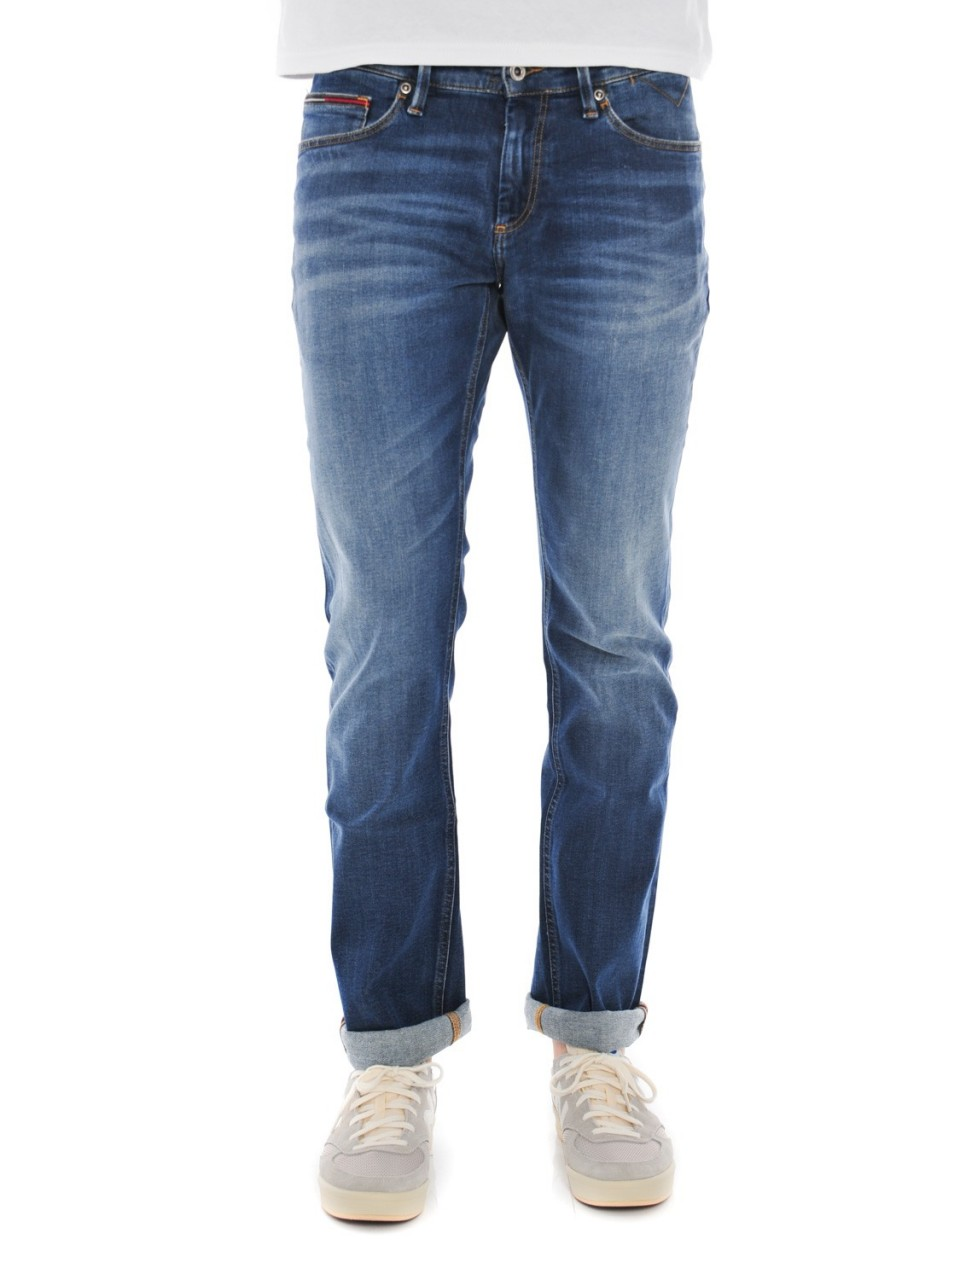 Tommy hilfiger Uomo Jeans Tommy Hilfiger Uomo Scanton Dynamic Stretch 01864F